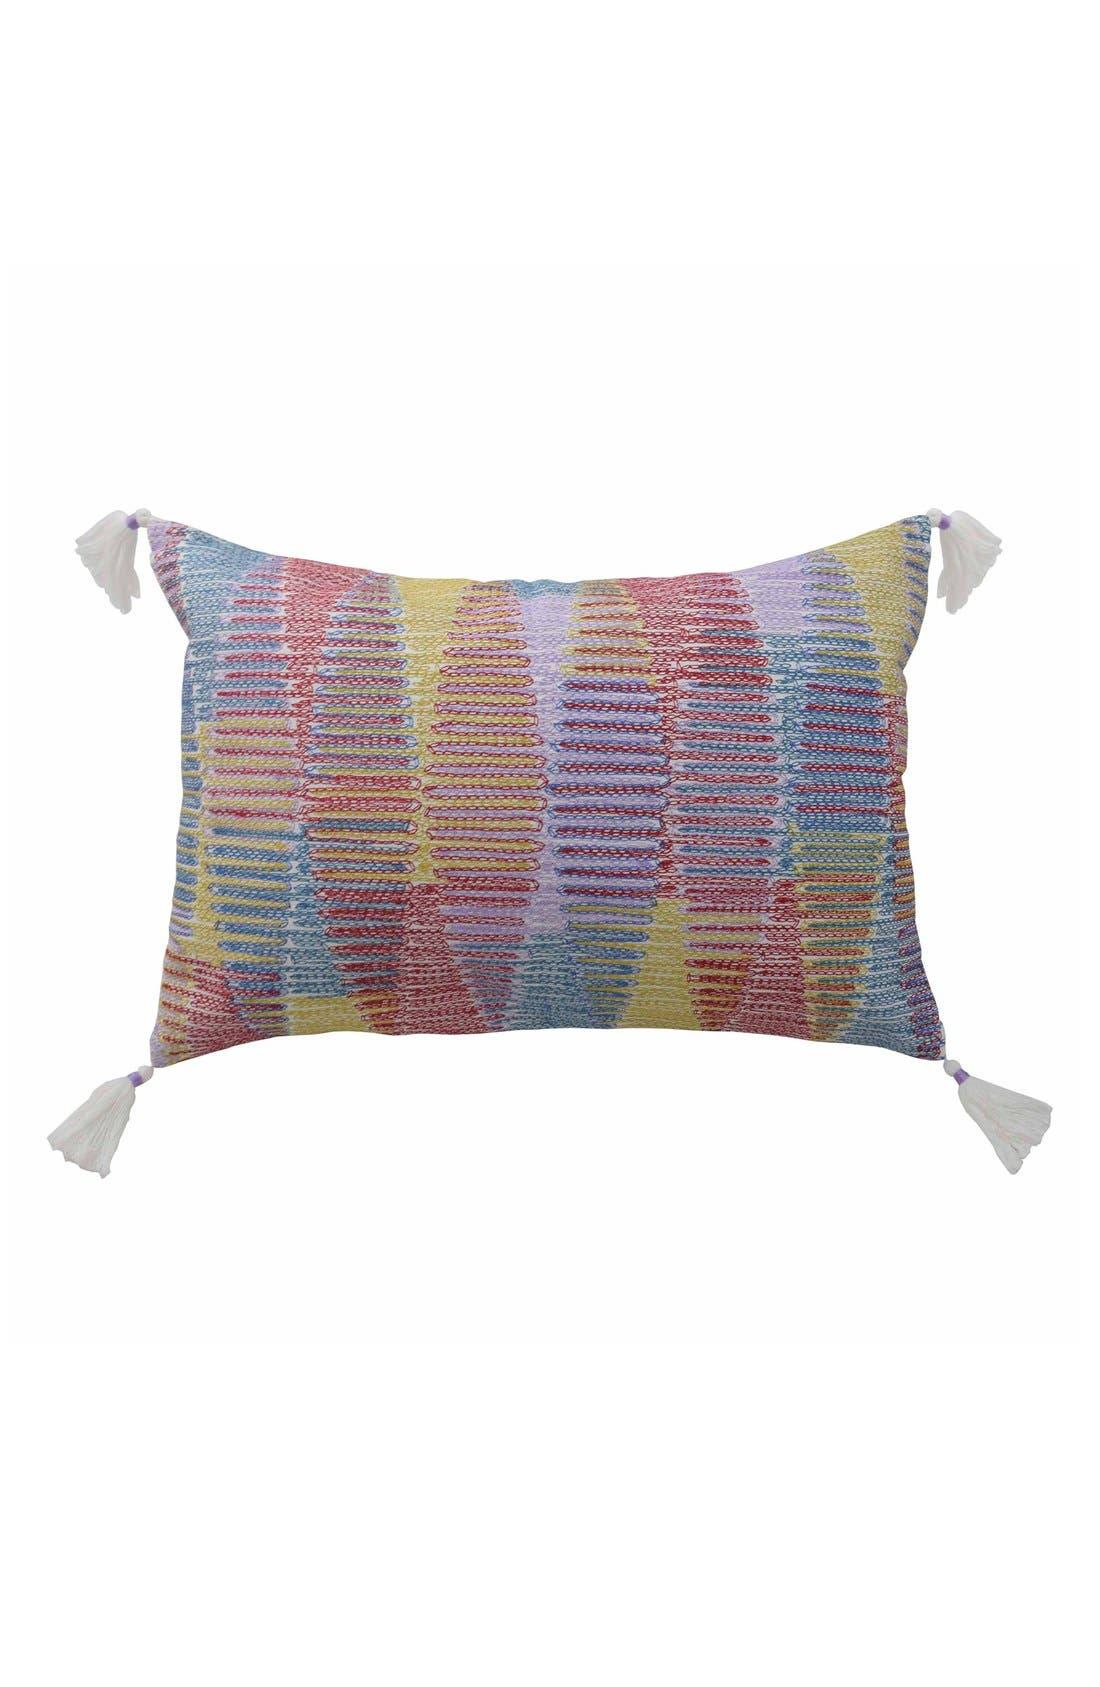 Delightful Blissliving Home U0027Tanzania Malikau0027 Pillow